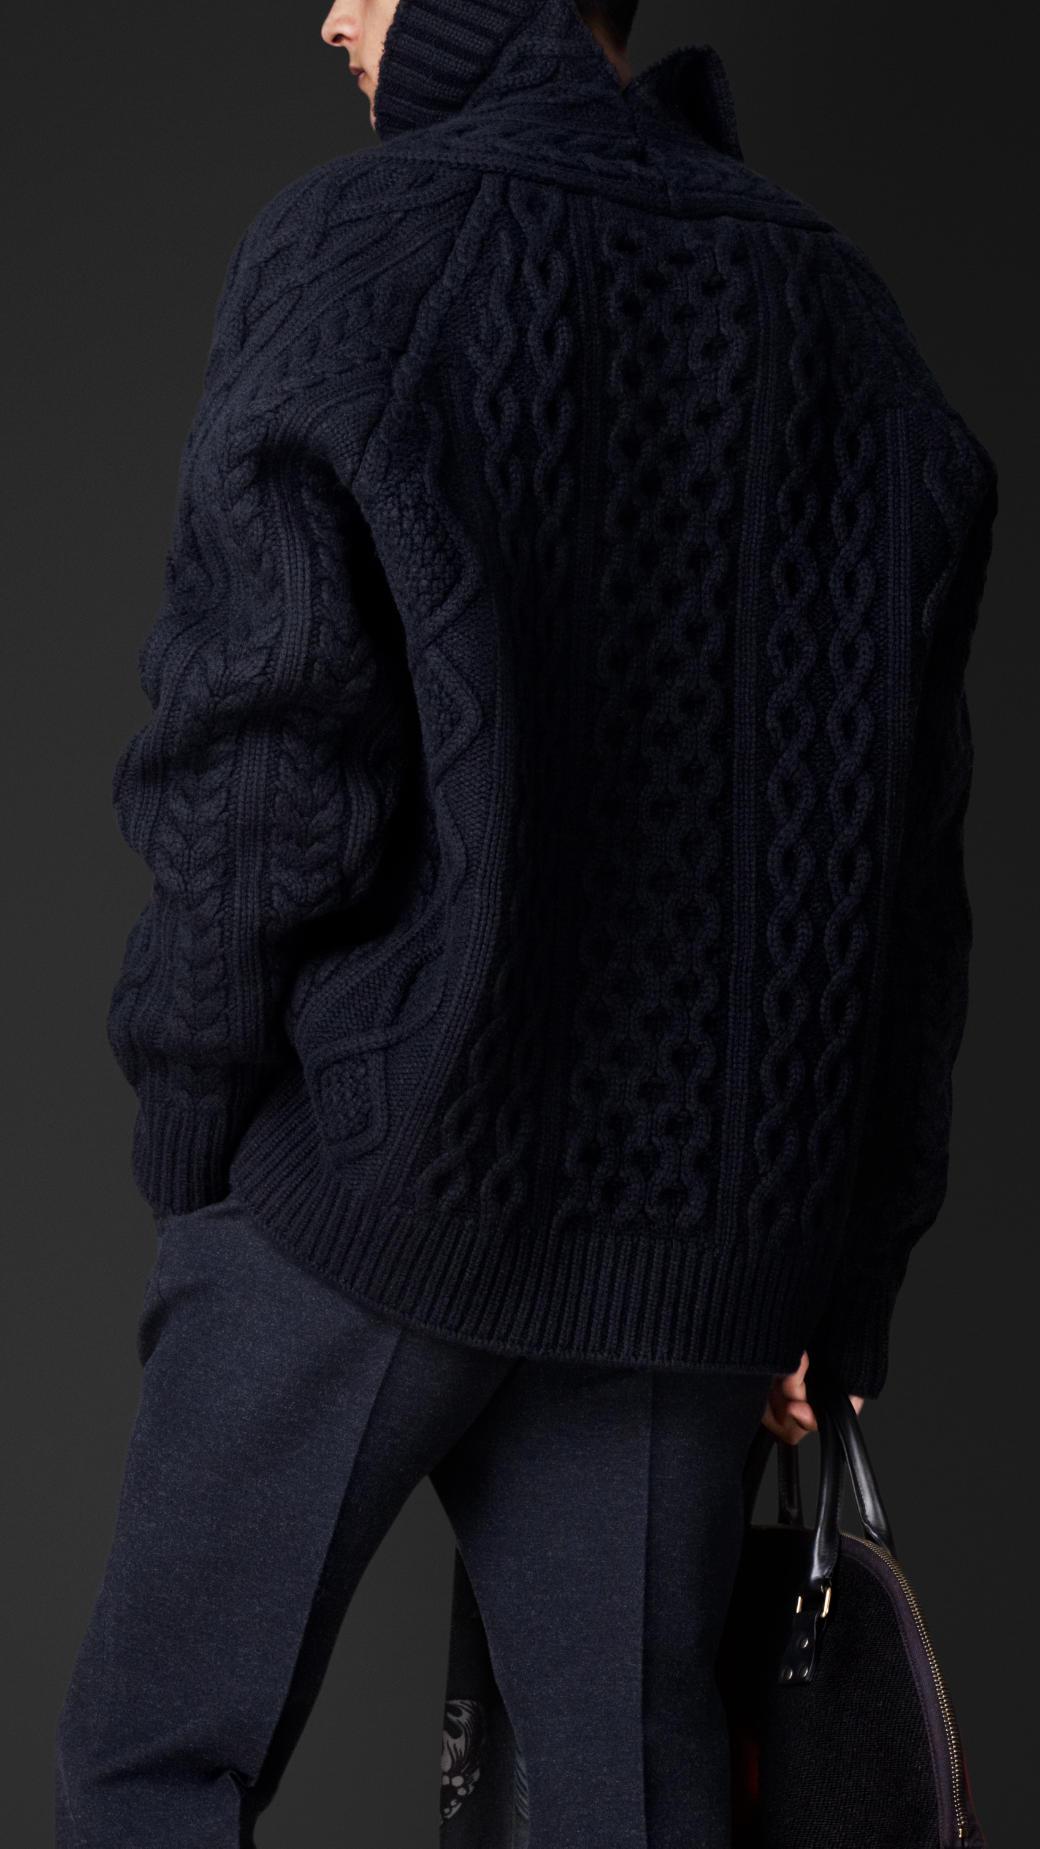 Lyst - Burberry Cashmere Needlepunch Aran Sweater in Black ...